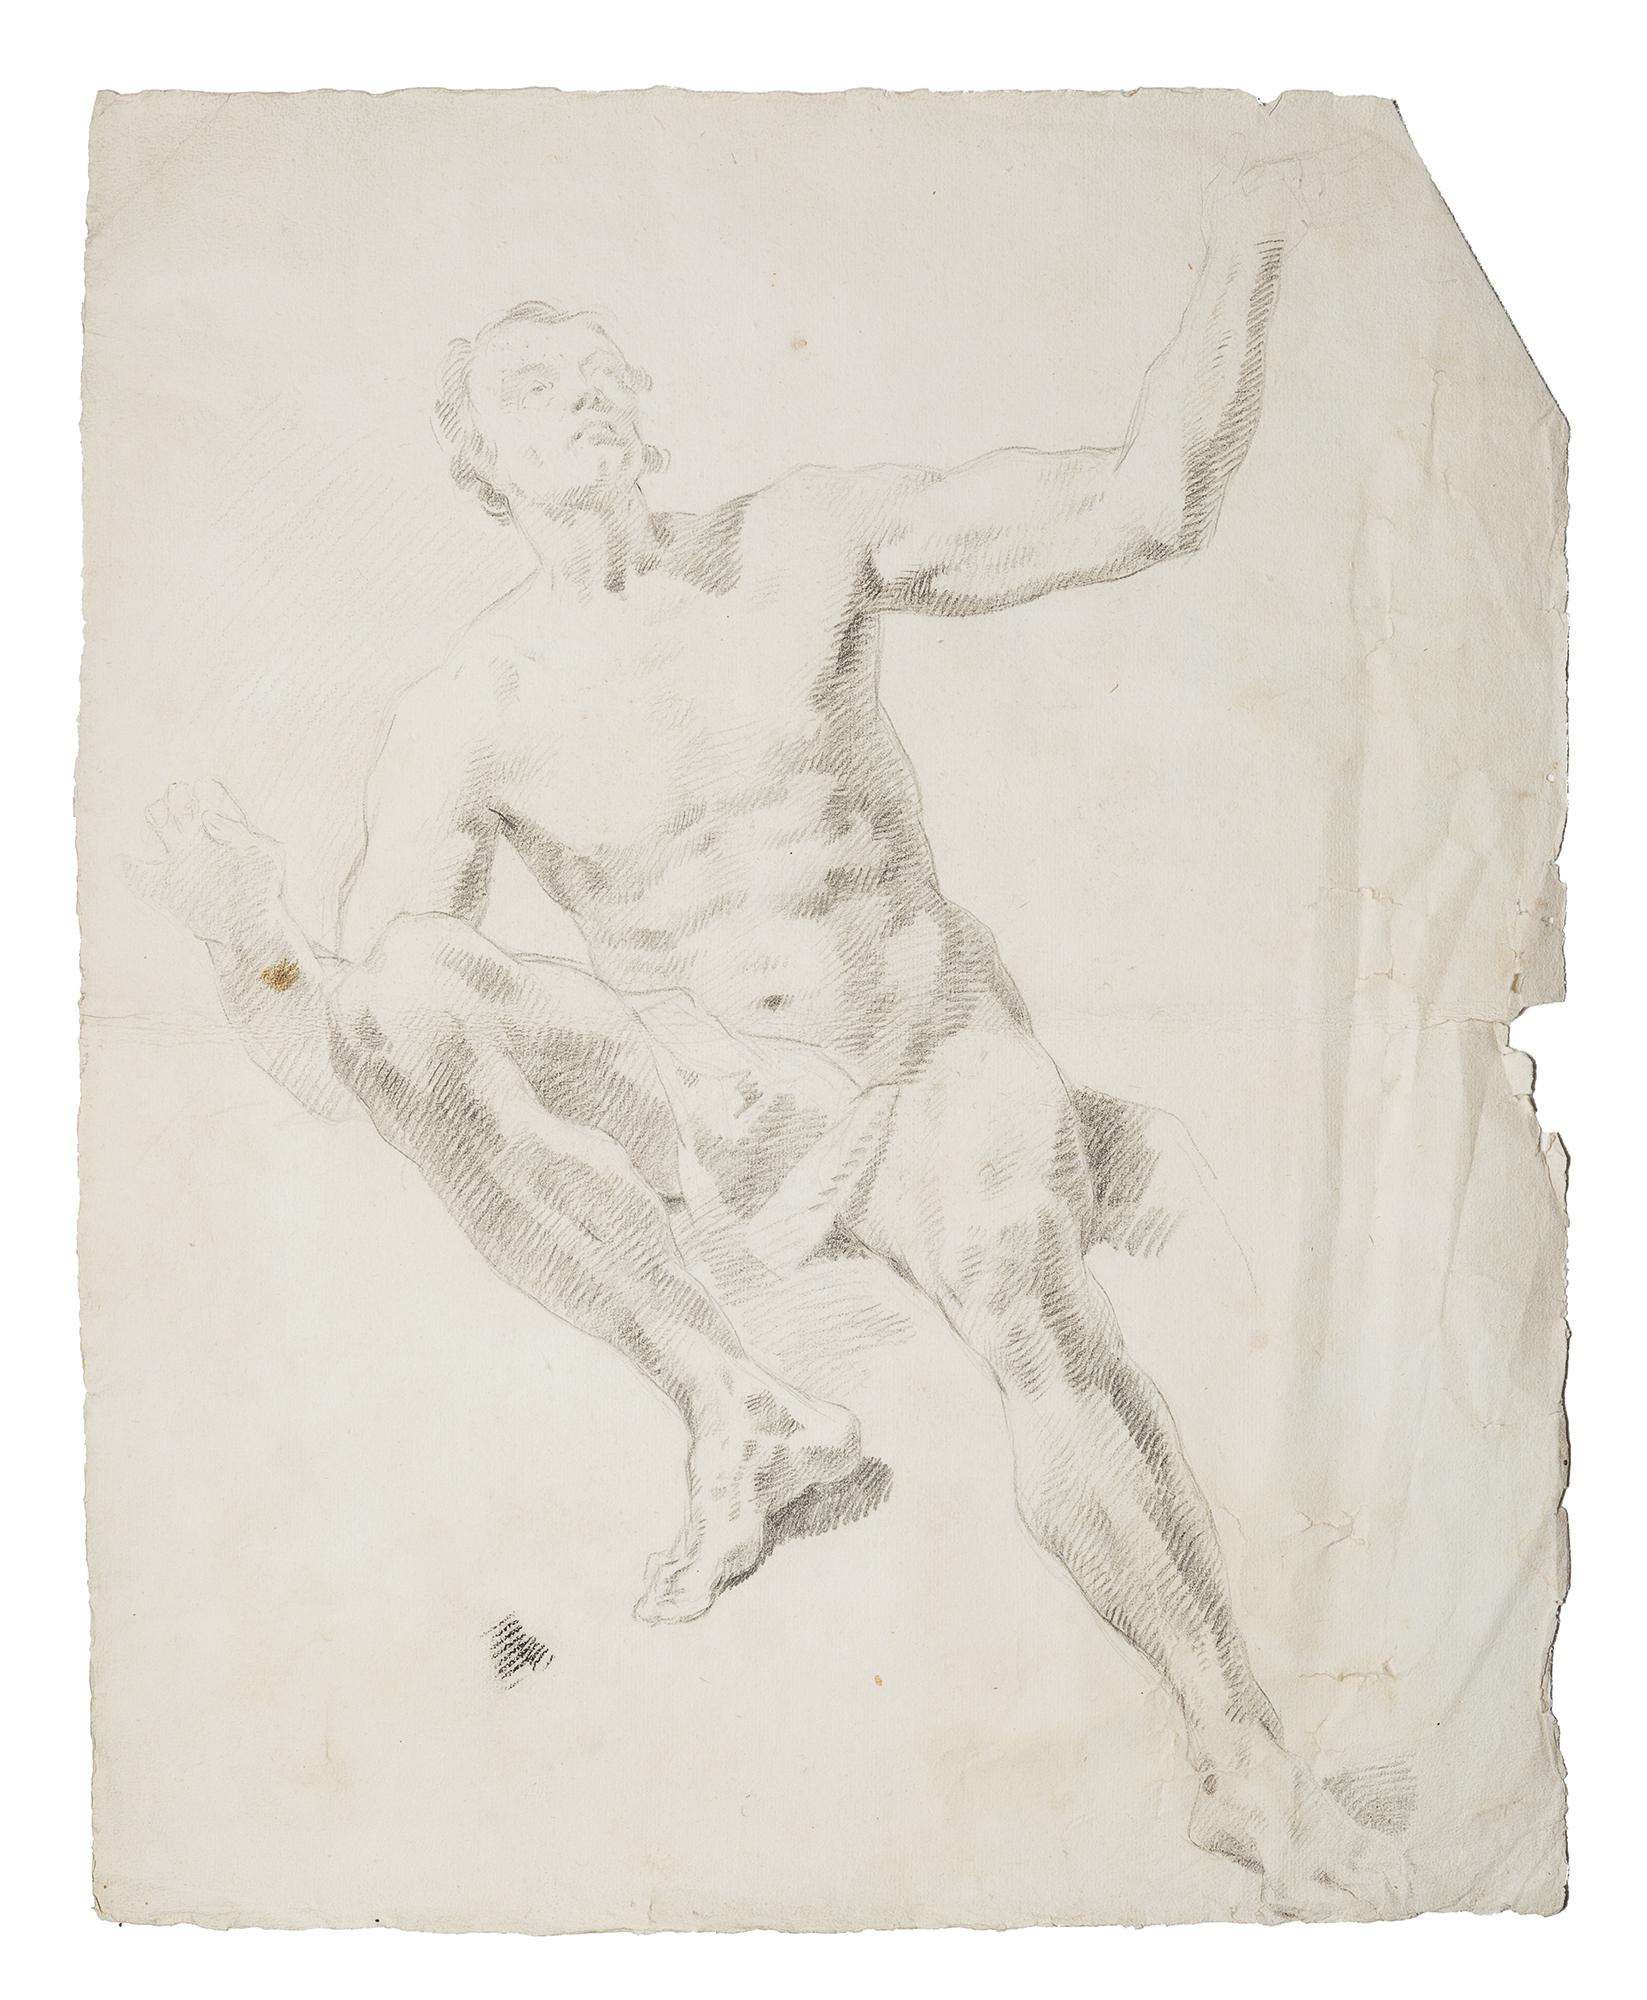 Studio di nudo virile a figura intera